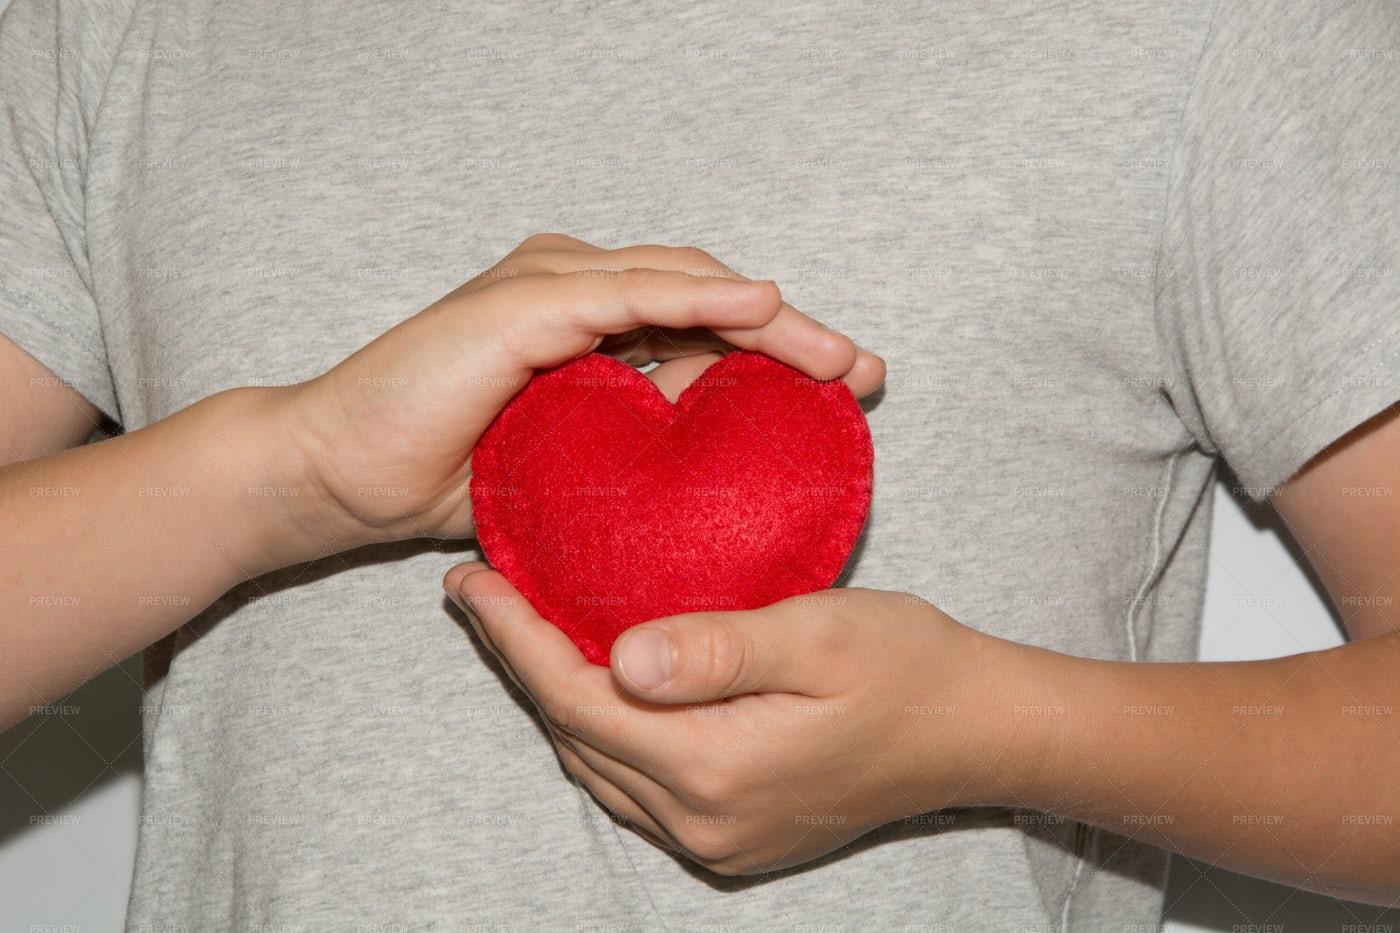 Men Holding A Red Heart: Stock Photos